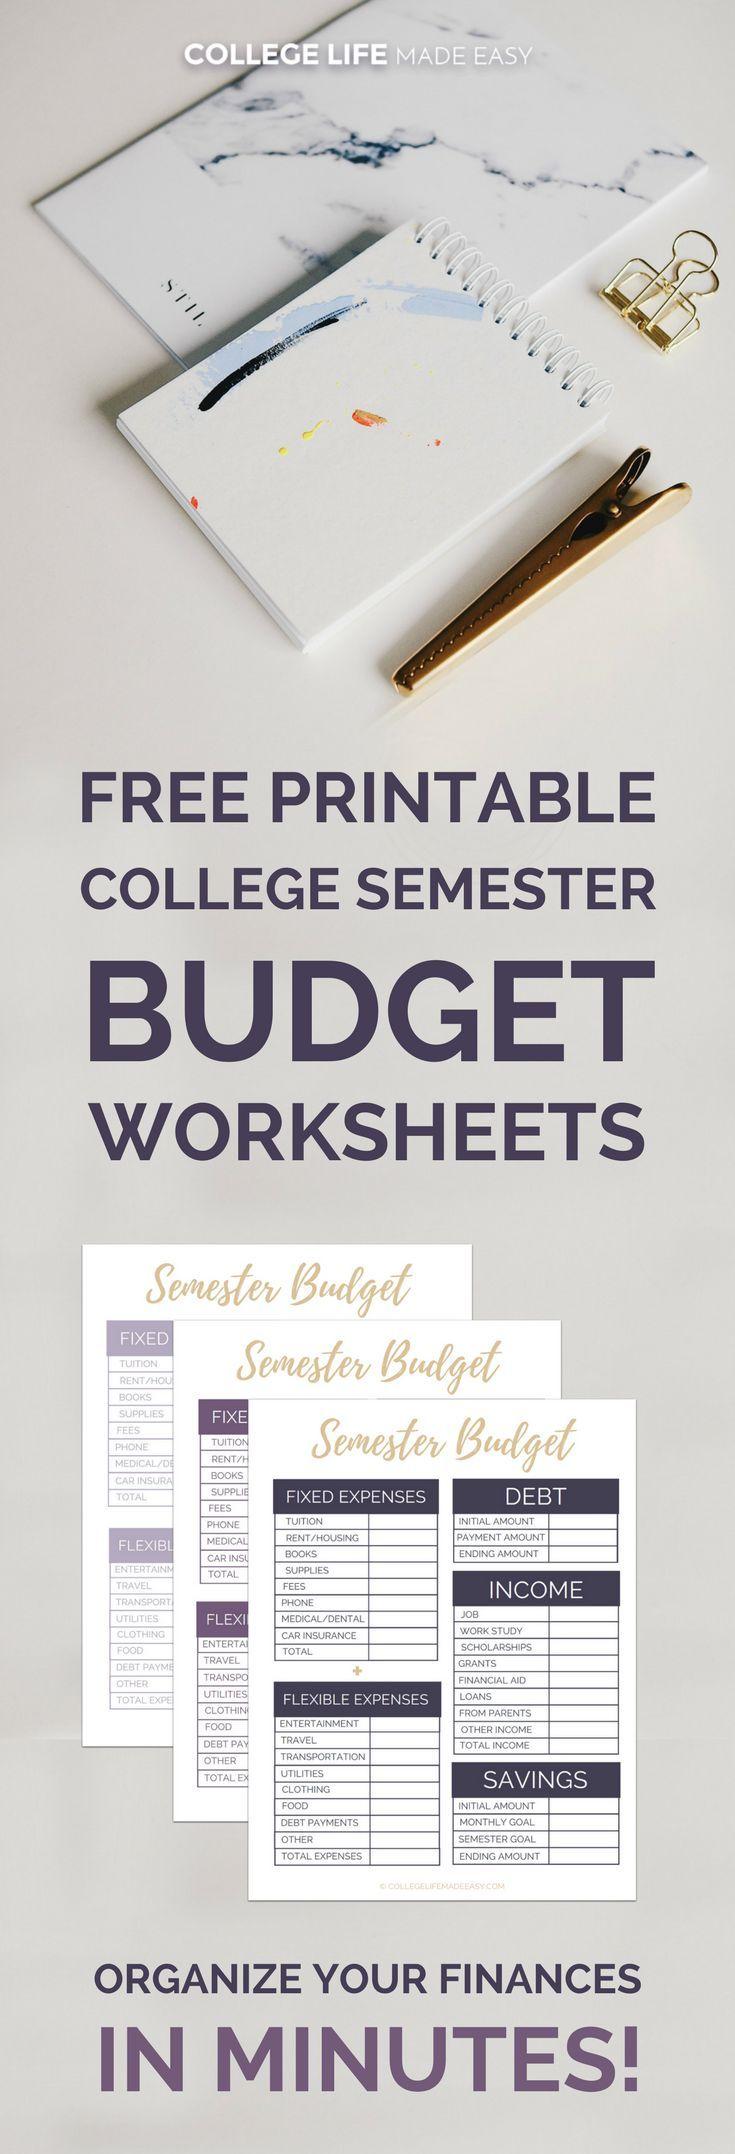 budget worksheet for college students